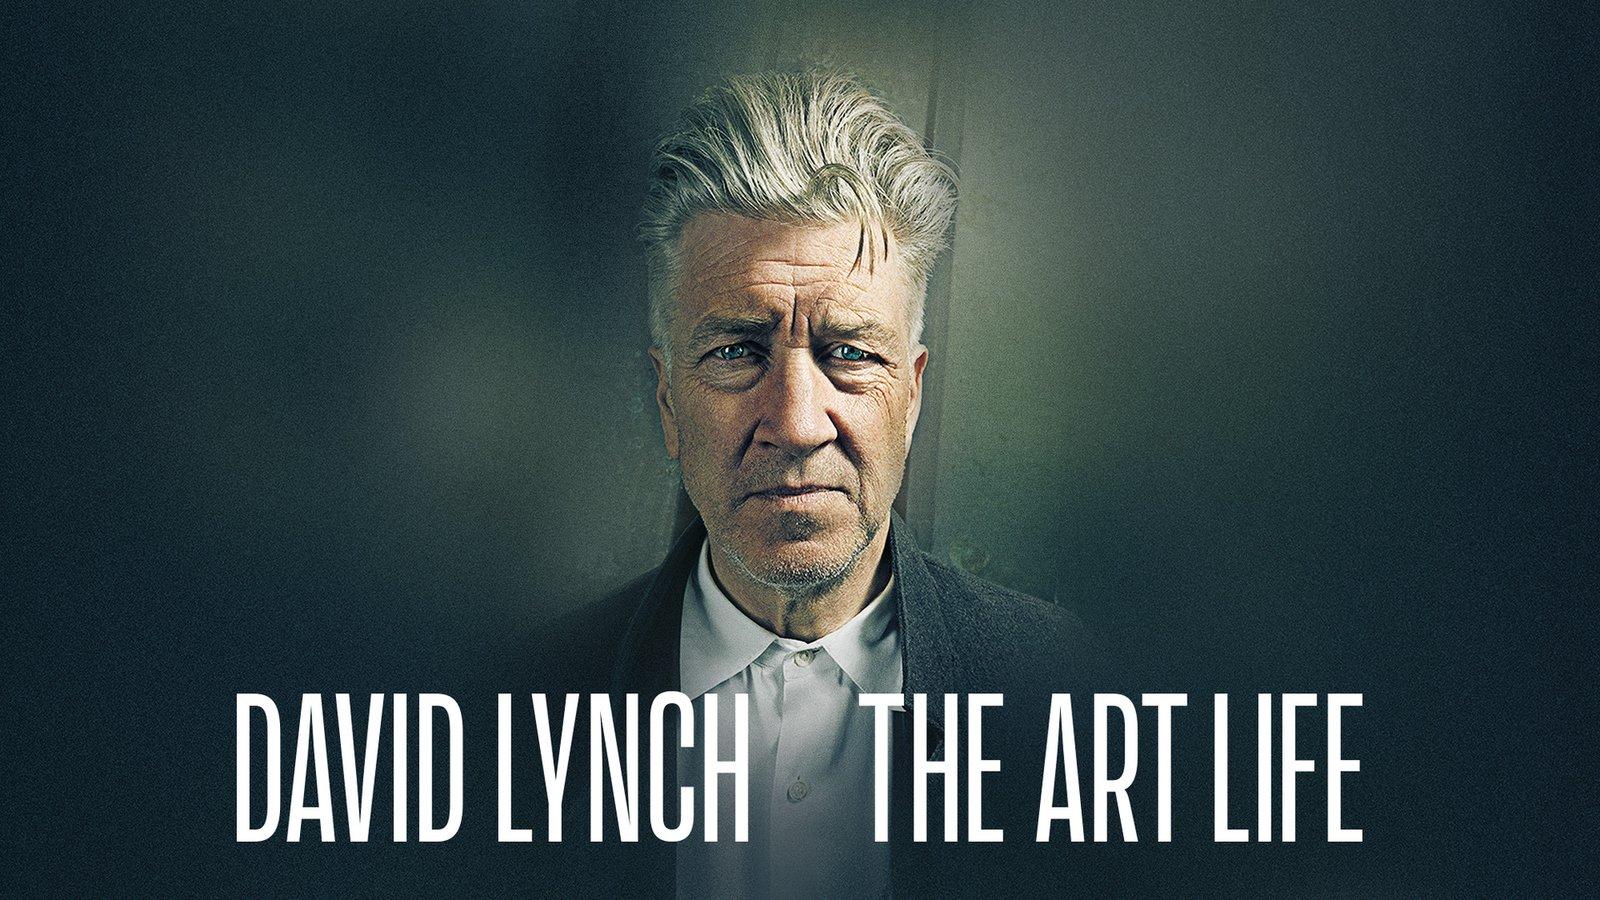 David Lynch: The Art Life - A Portrait of An Iconic Filmmaker